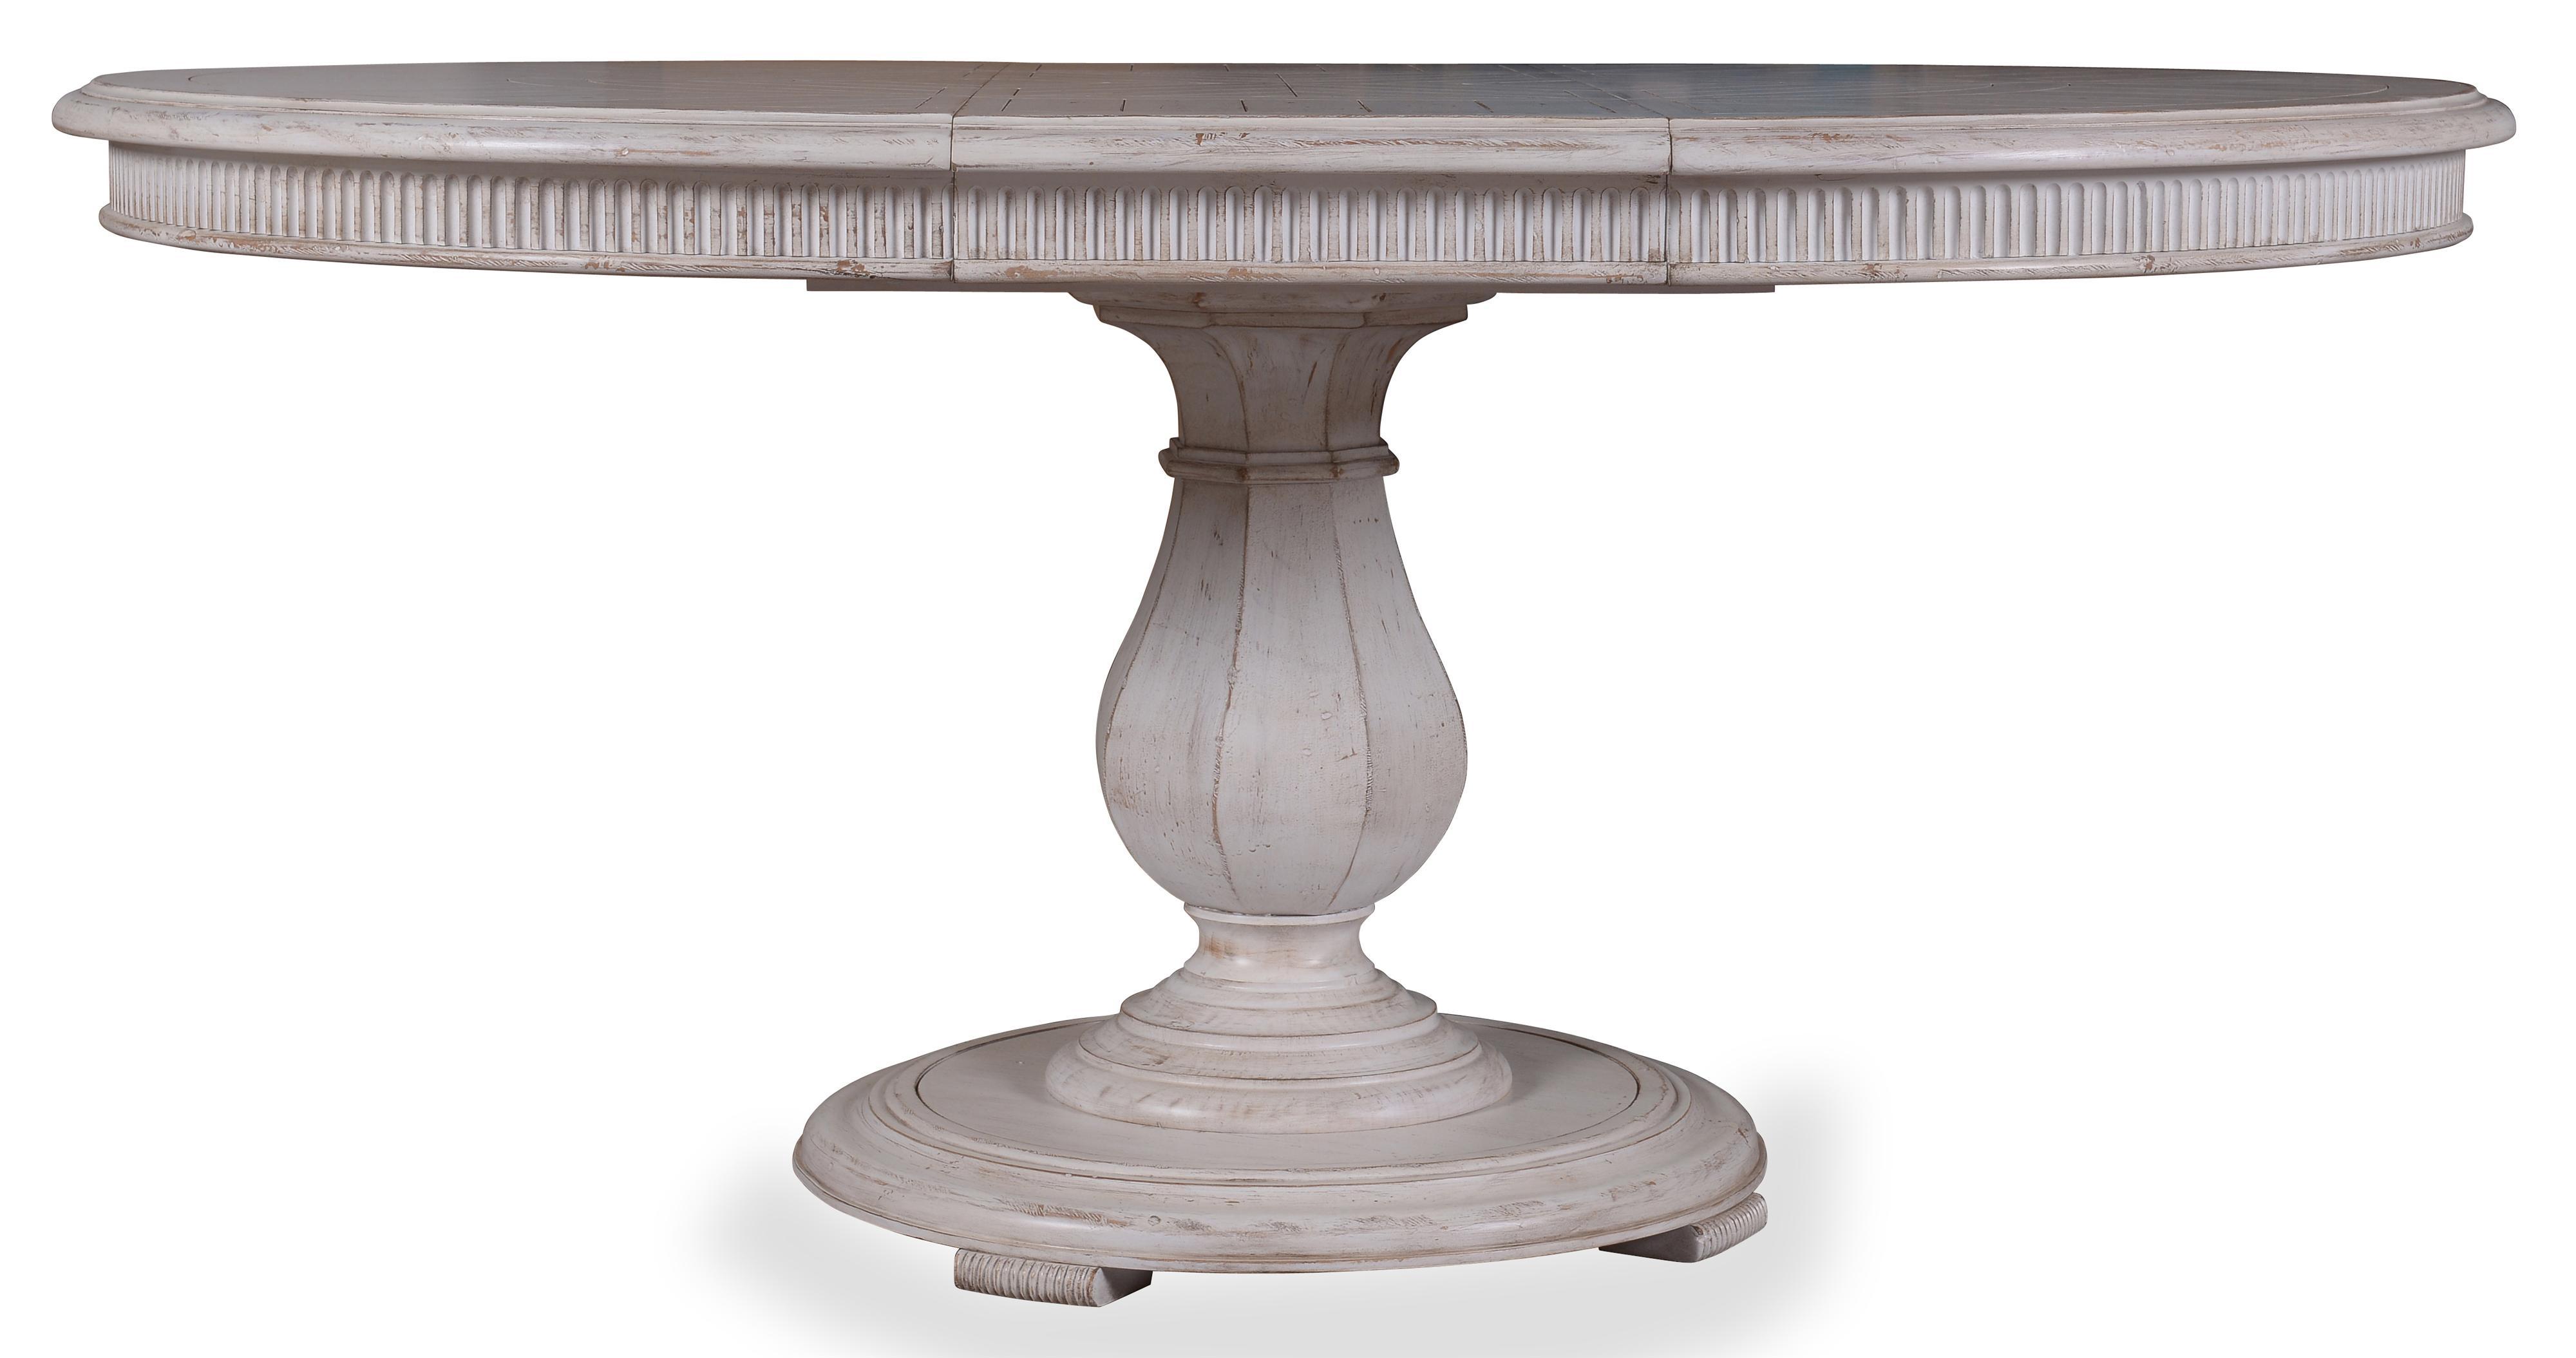 Belfort Signature Belle Haven Keton Round Dining Table - Item Number: 217225-2617